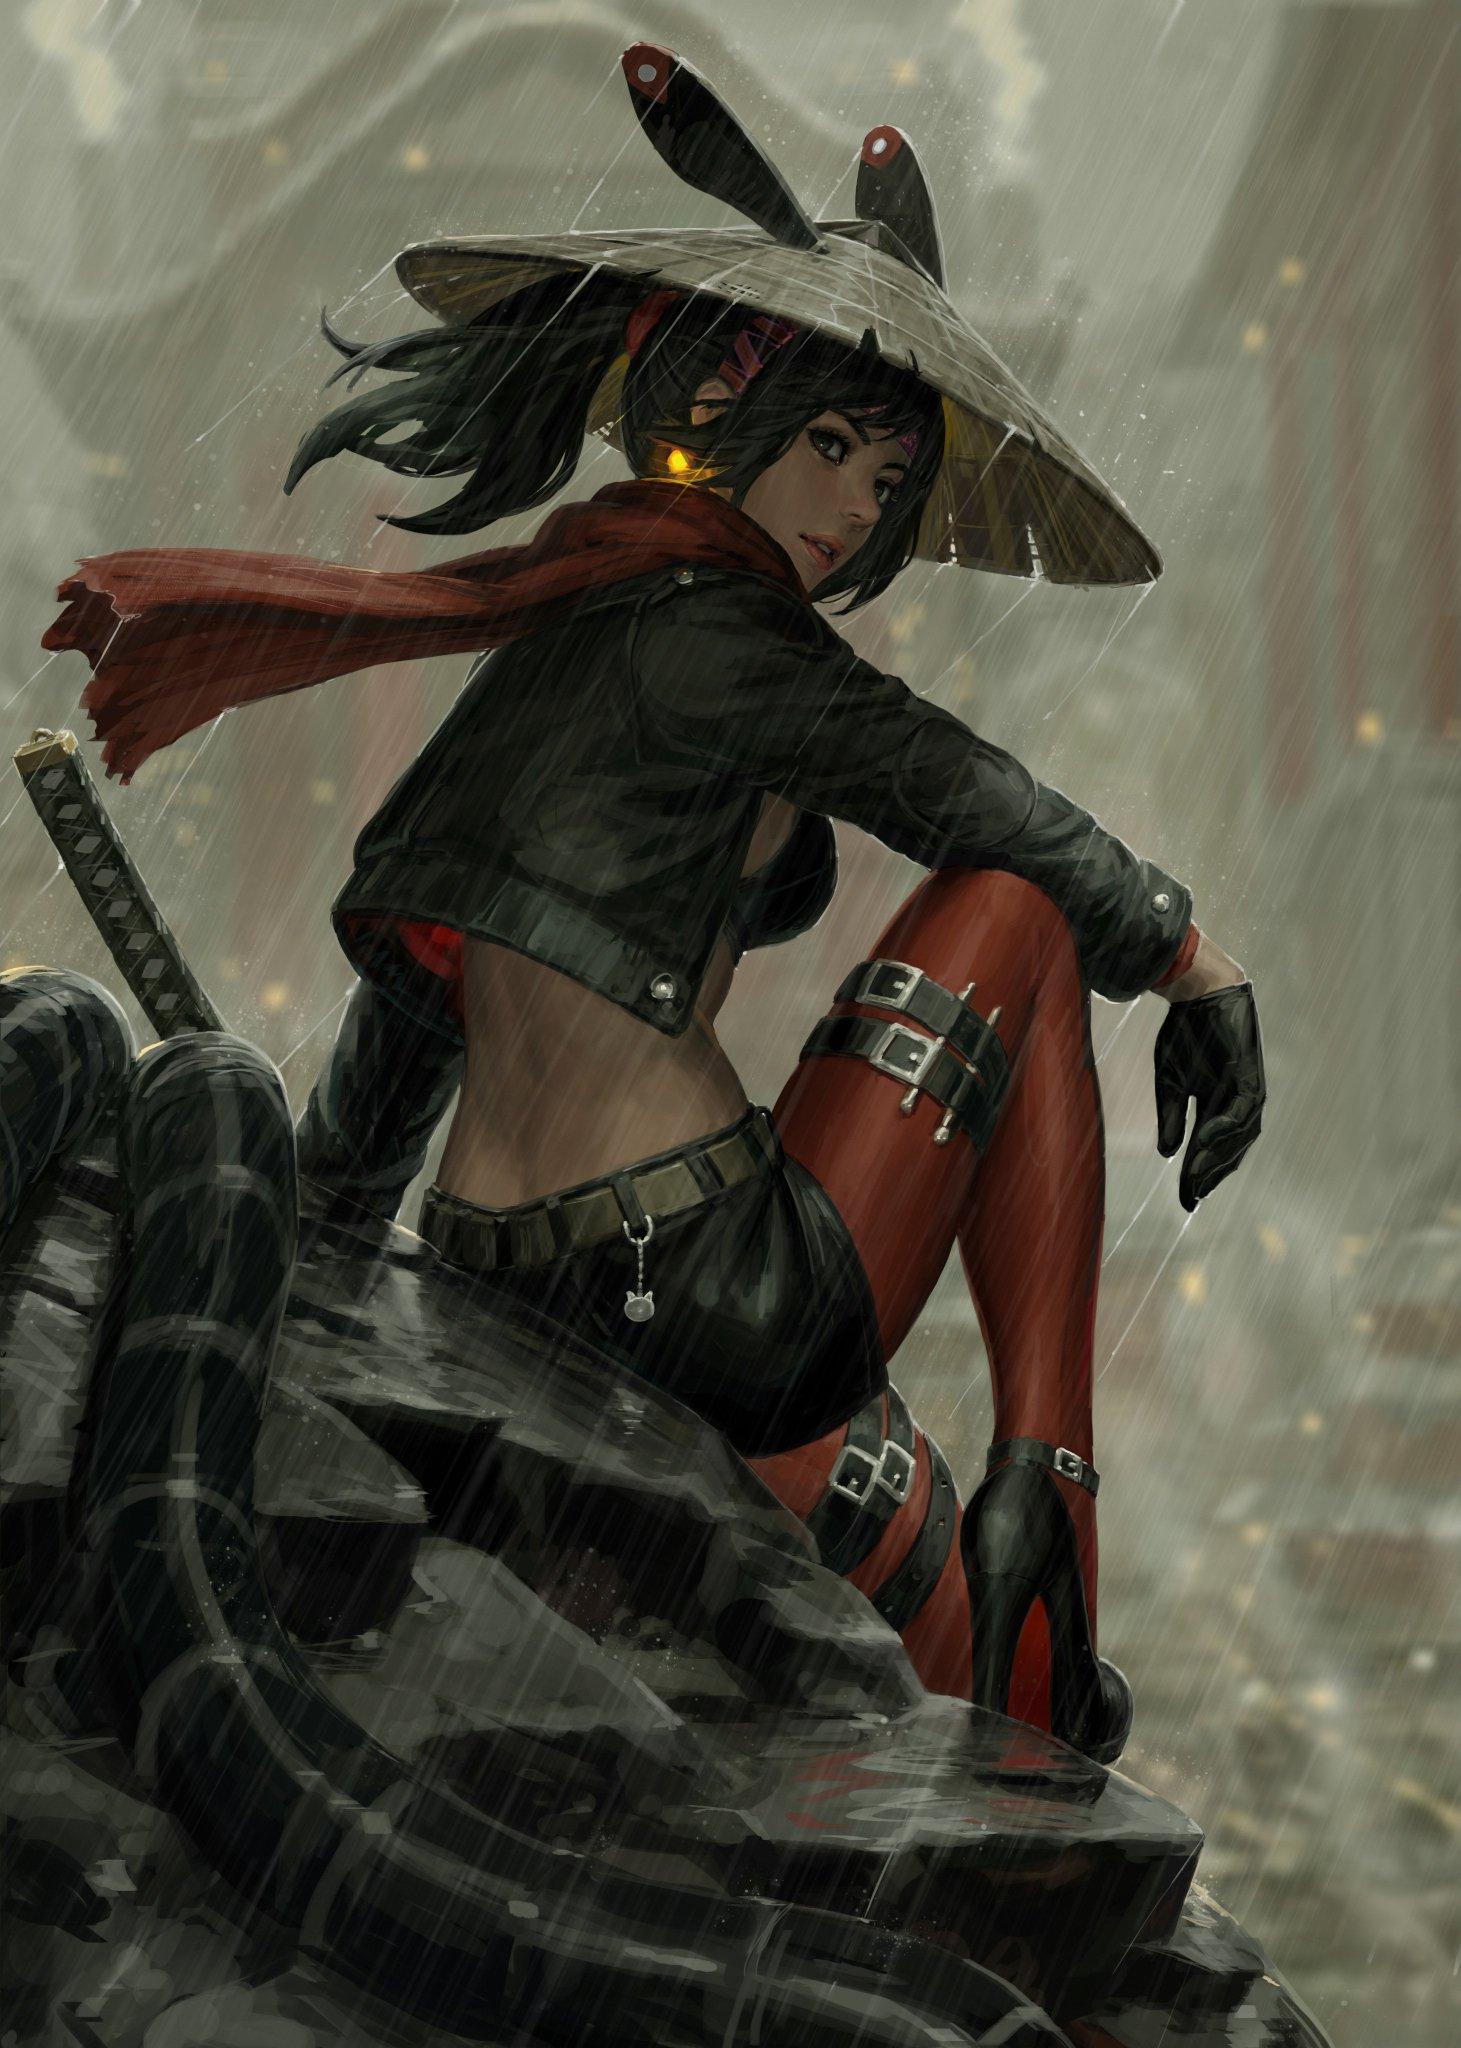 Japanese Samurai Girl Wallpaper Guweiz On Twitter Quot Shinobi